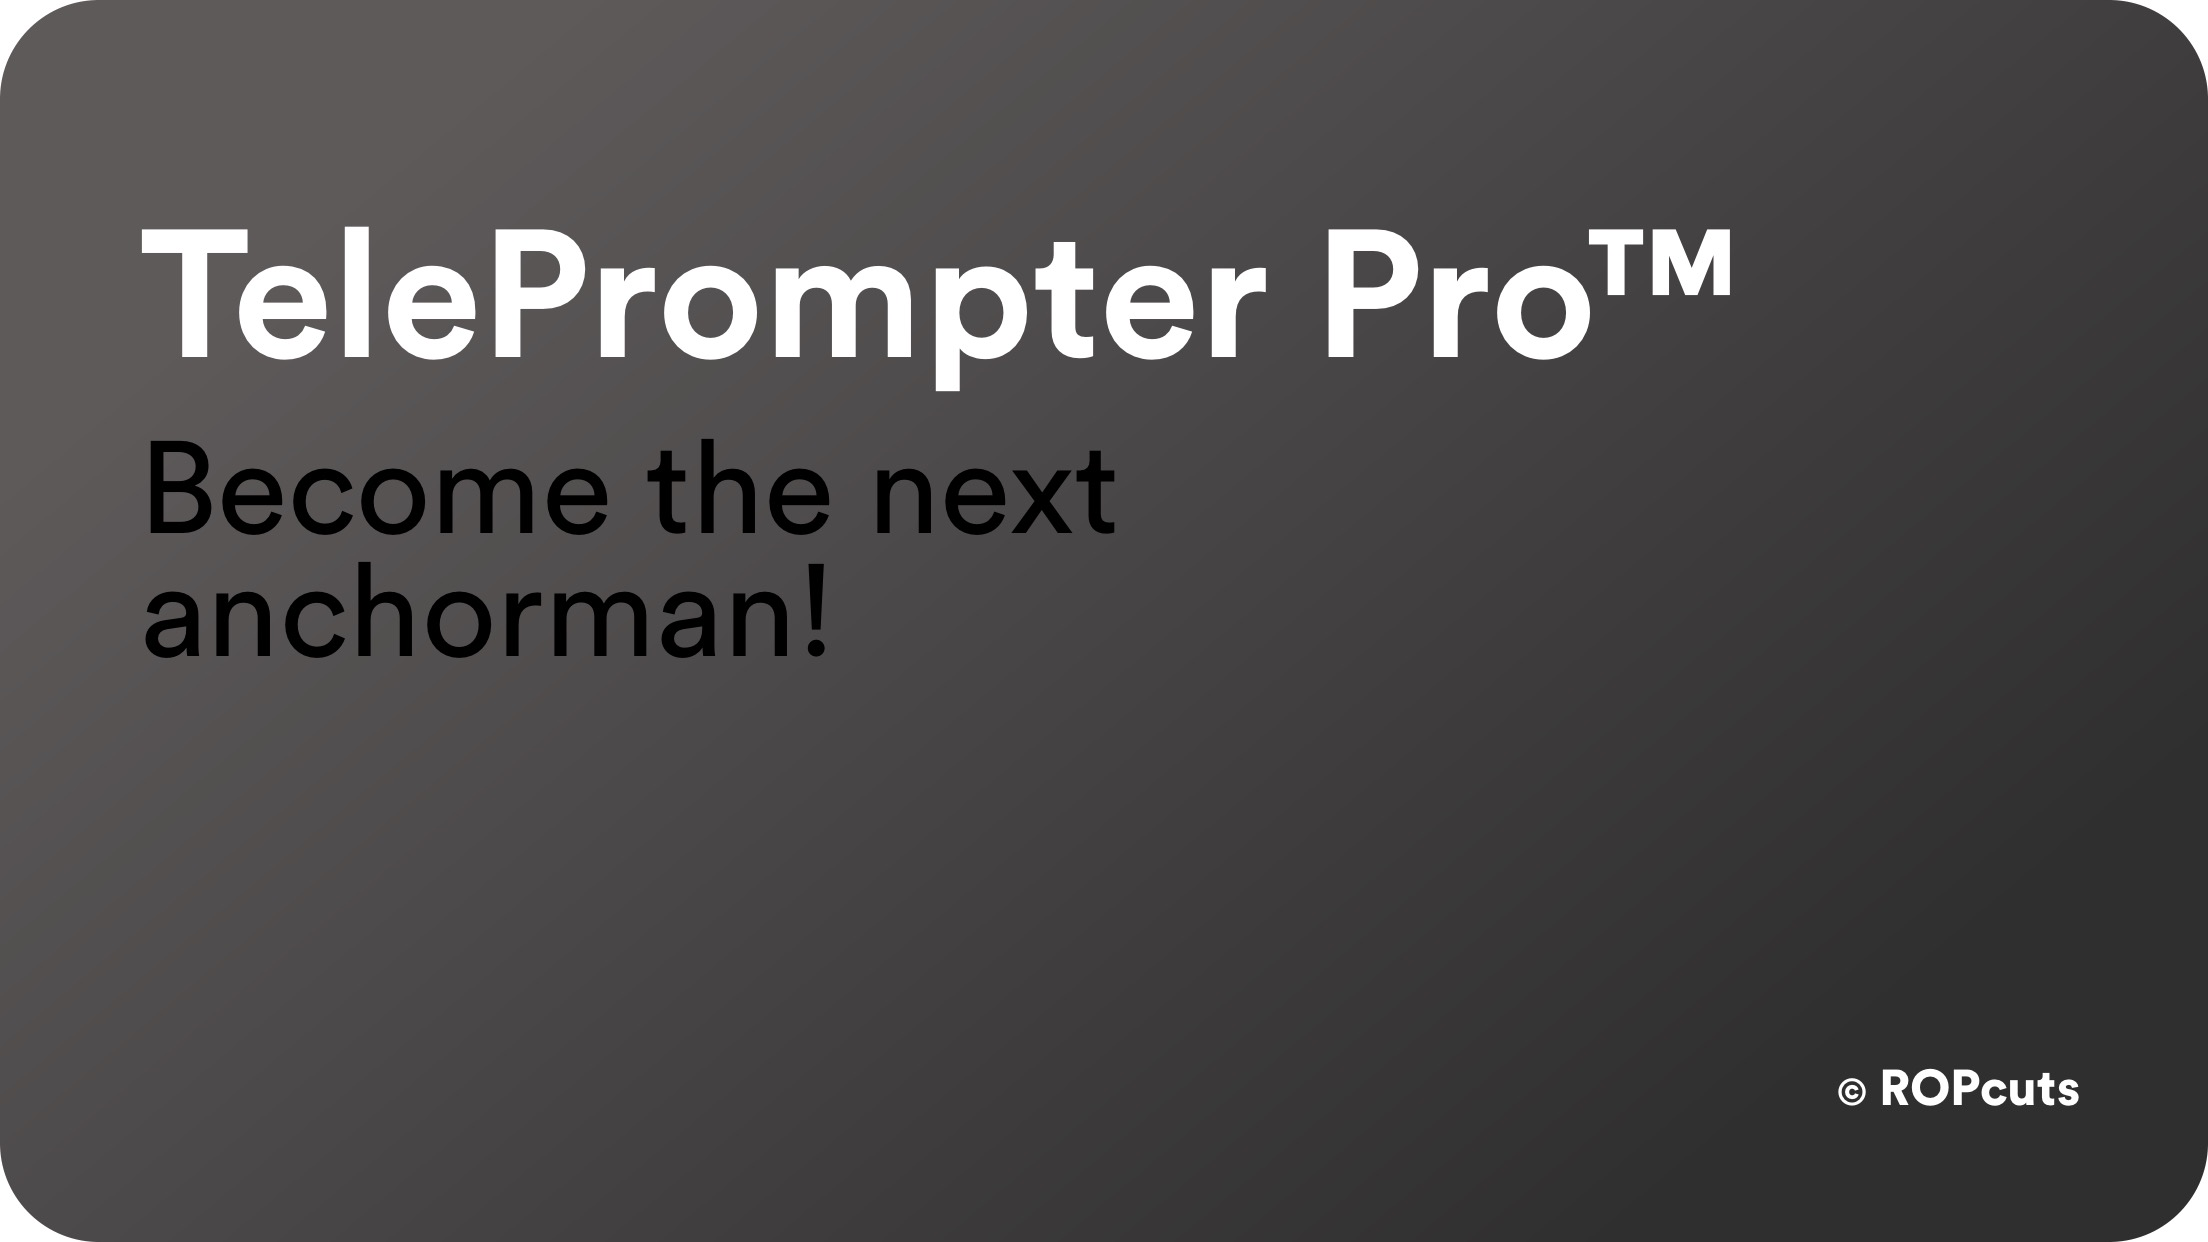 TelePrompter Pro™